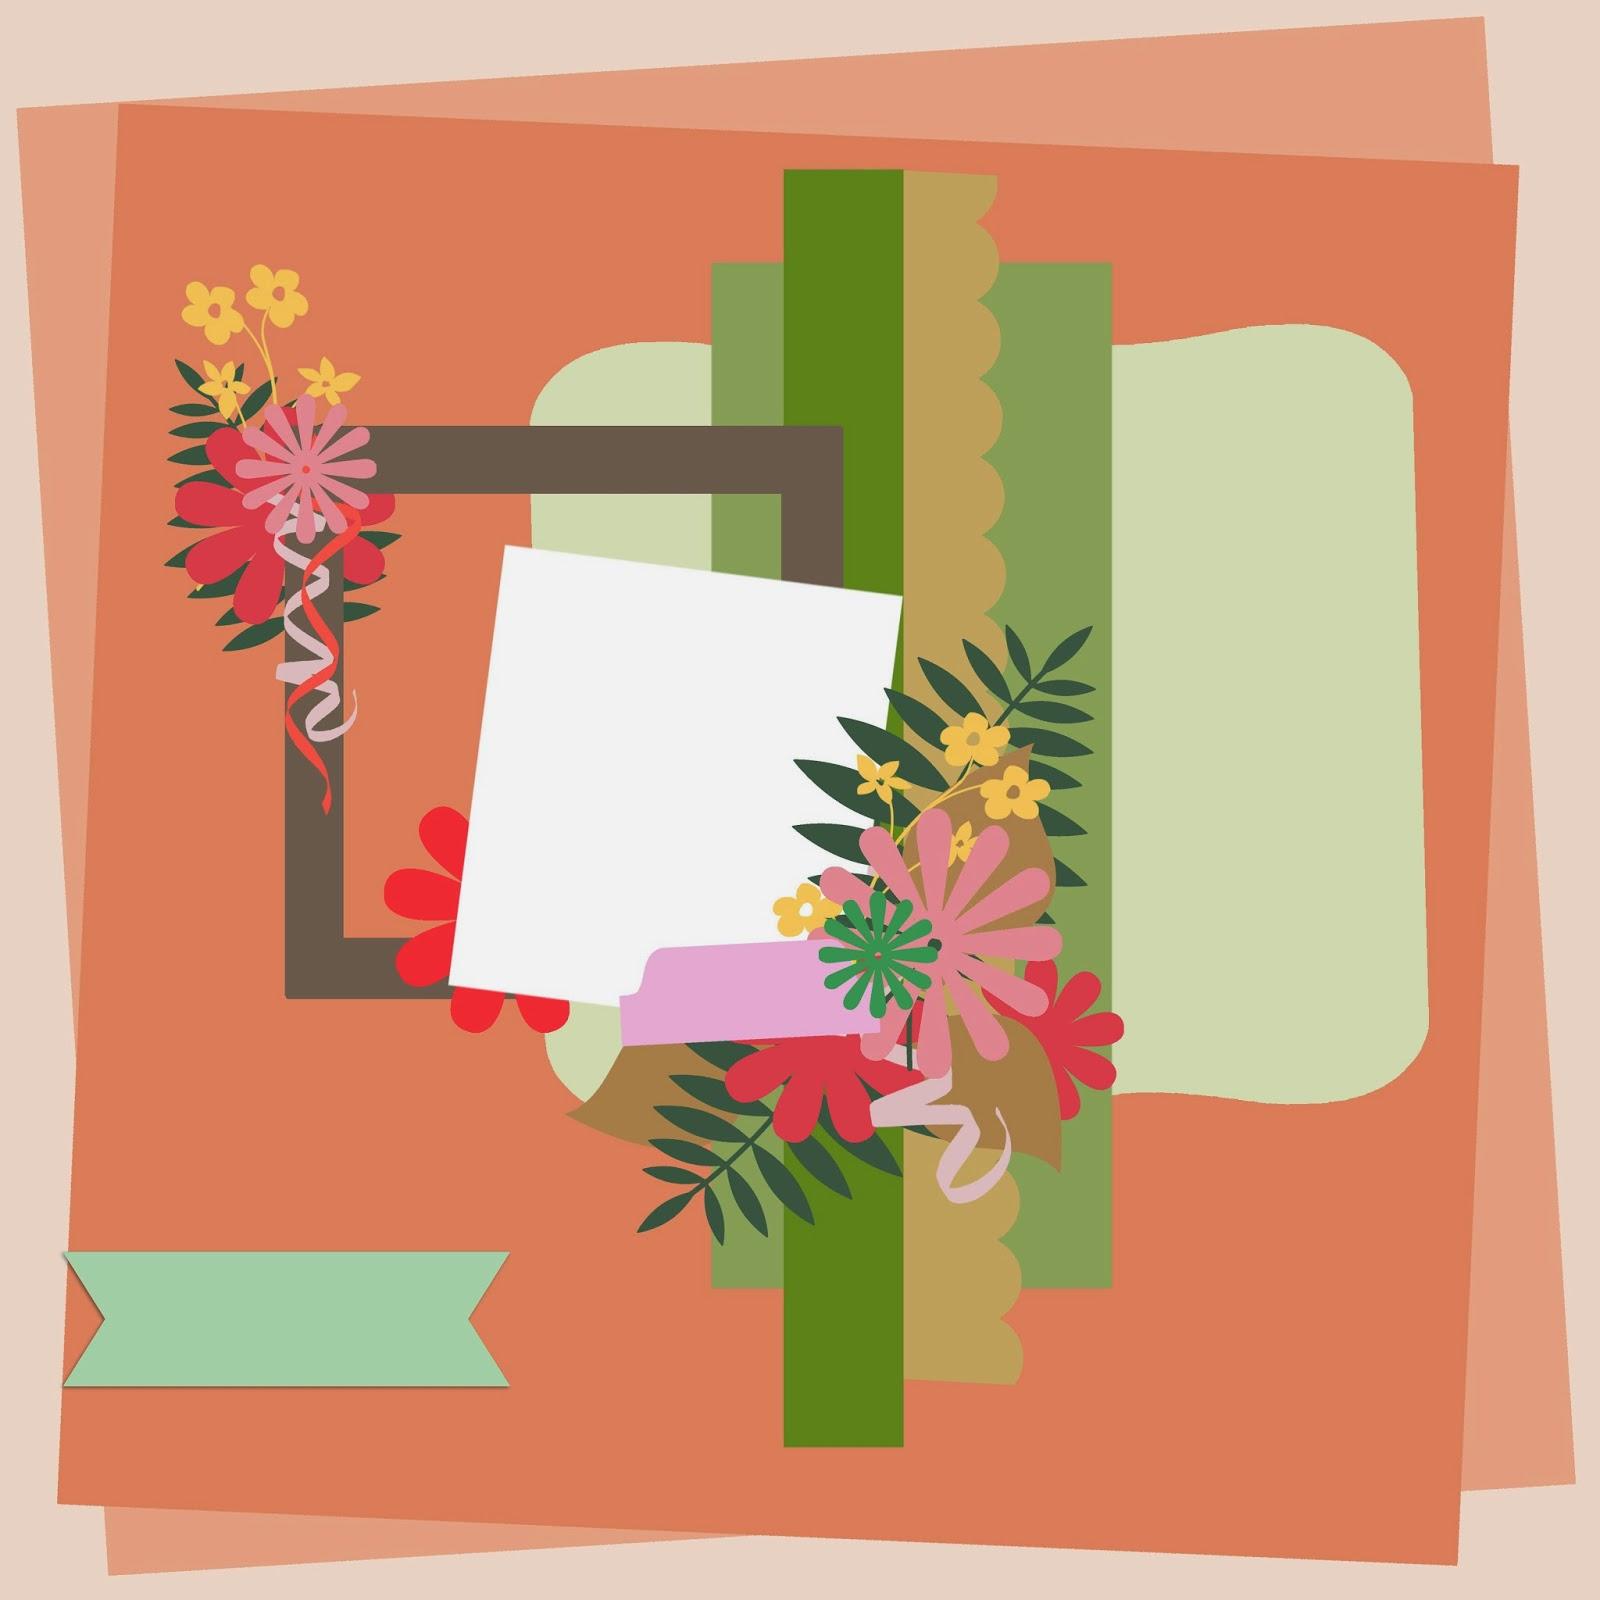 http://4.bp.blogspot.com/-Zy7jJgx9-kY/VJNVeK3OtFI/AAAAAAAABAw/KVumY3in9_E/s1600/OklahomaDawn12_13_14_second_edited-1.jpg